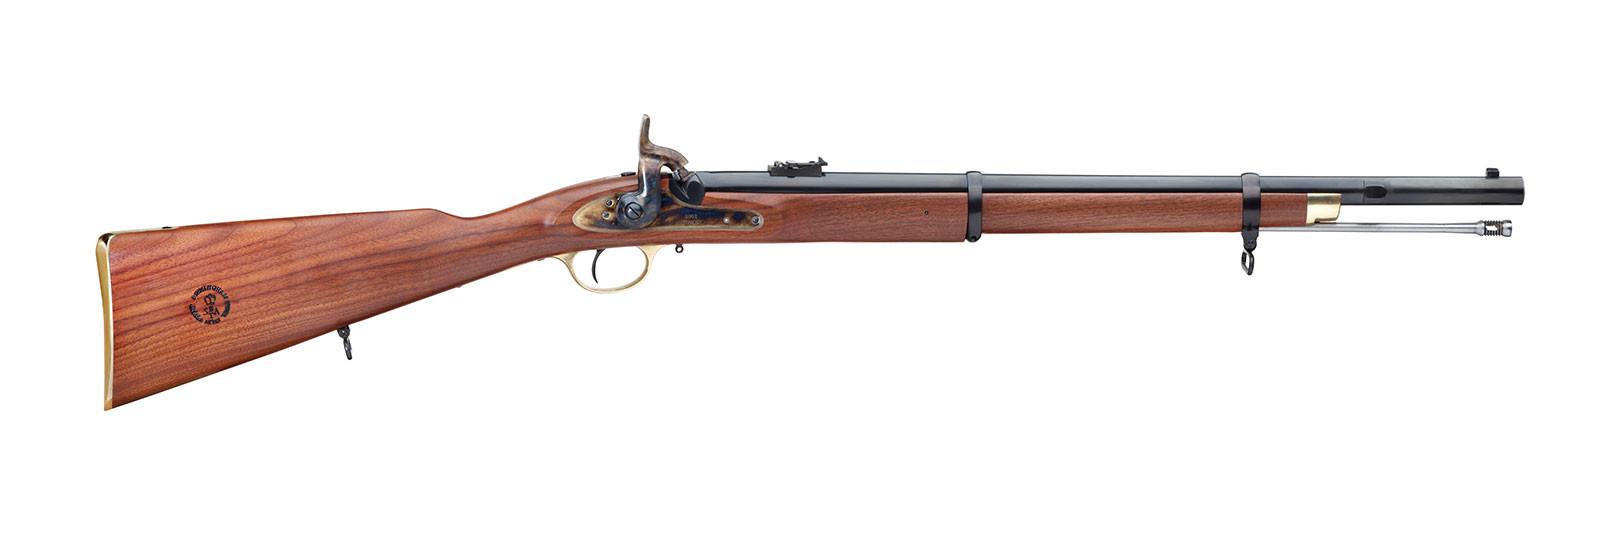 Fucile Enfield Musketoon P1861